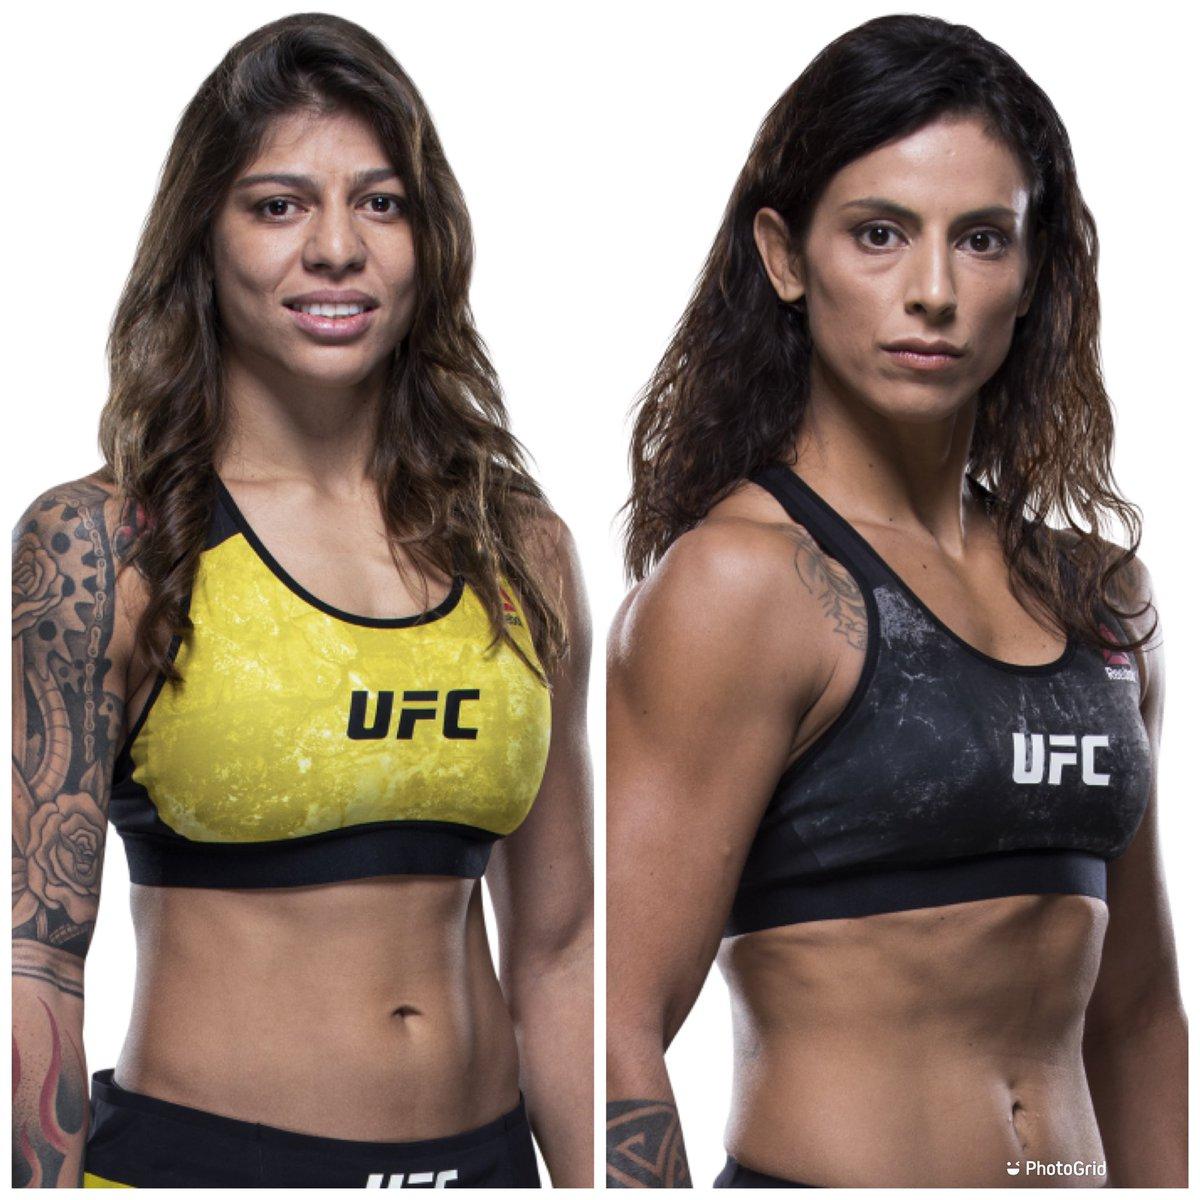 👊👊 This Saturday the 19th 👊👊 Flyweights Mayra Bueno Silva and Mara Romero Borello will clash on the Prelim Card. LIVE on ESPN+ #UFCFightNight #UFCLasVegas #Mayrabuenosilva #mararomeroborello #womensmma #wmma #combatsports #ufcvegas https://t.co/wioJNcxj4U